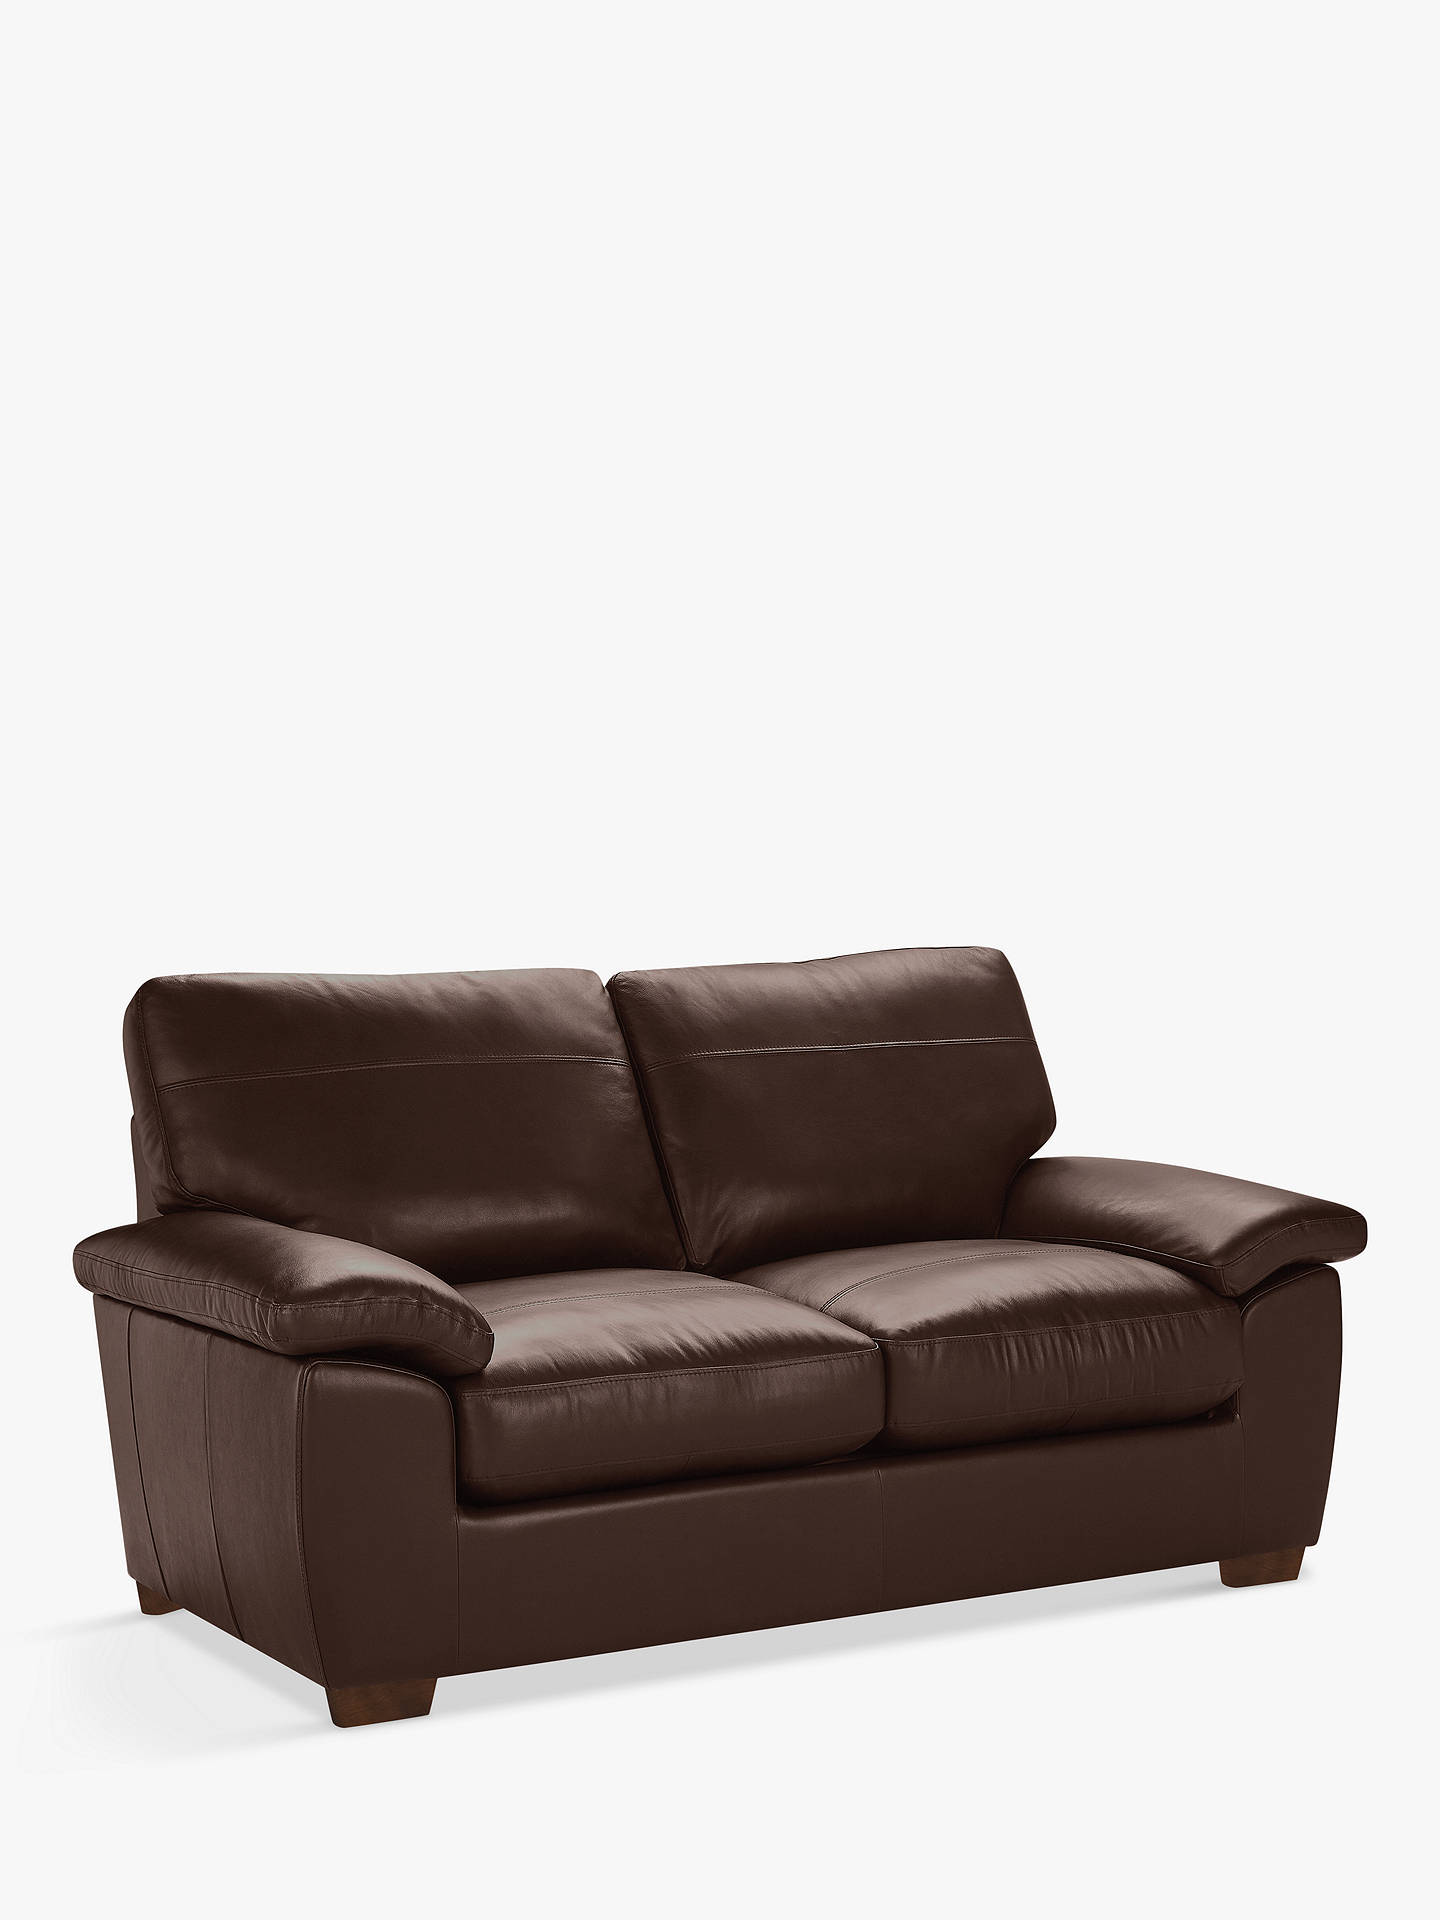 John Lewis & Partners Camden Medium 2 Seater Leather Sofa, Dark Leg, Nature  Brown